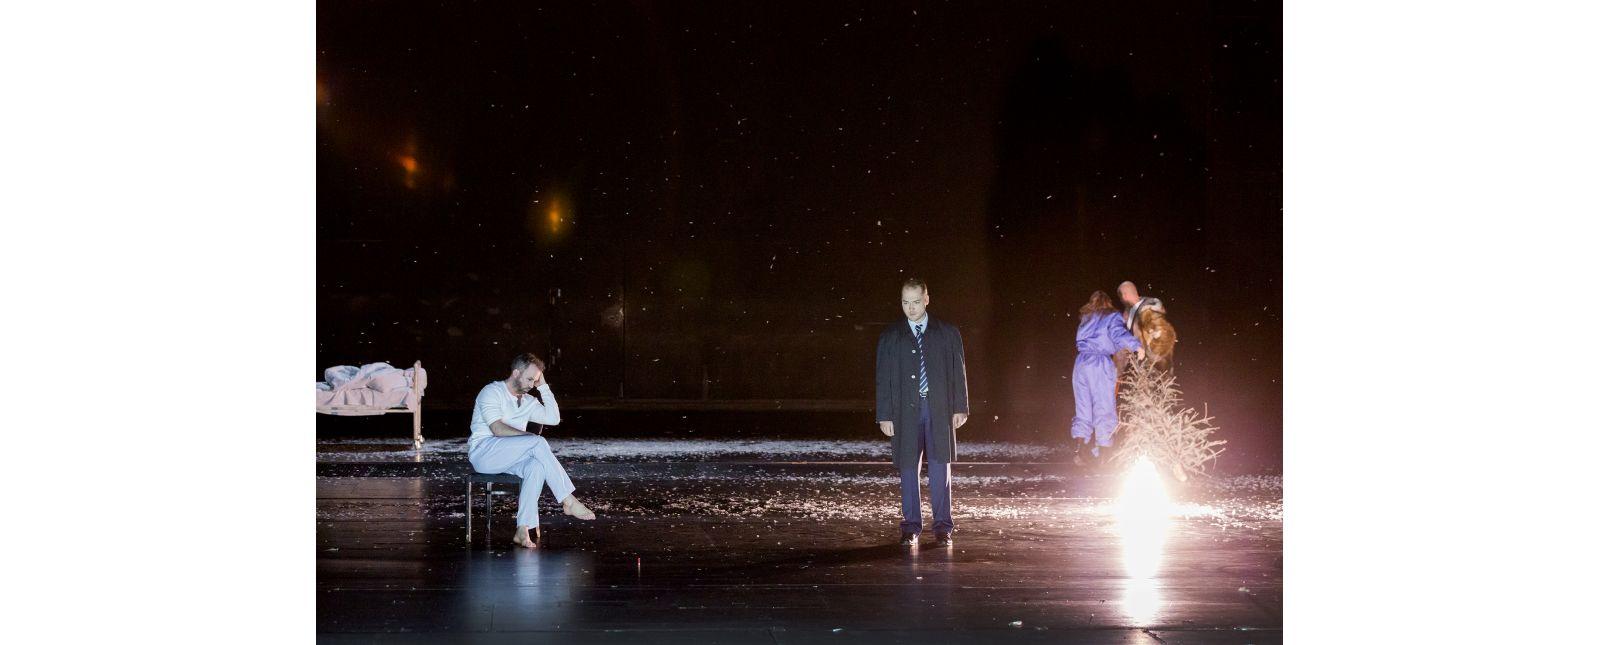 Angels in America // Robin Adams, John Carpenter, Inga Schäfer, Bernhard Landauer // Rainer Muranyi // 2018